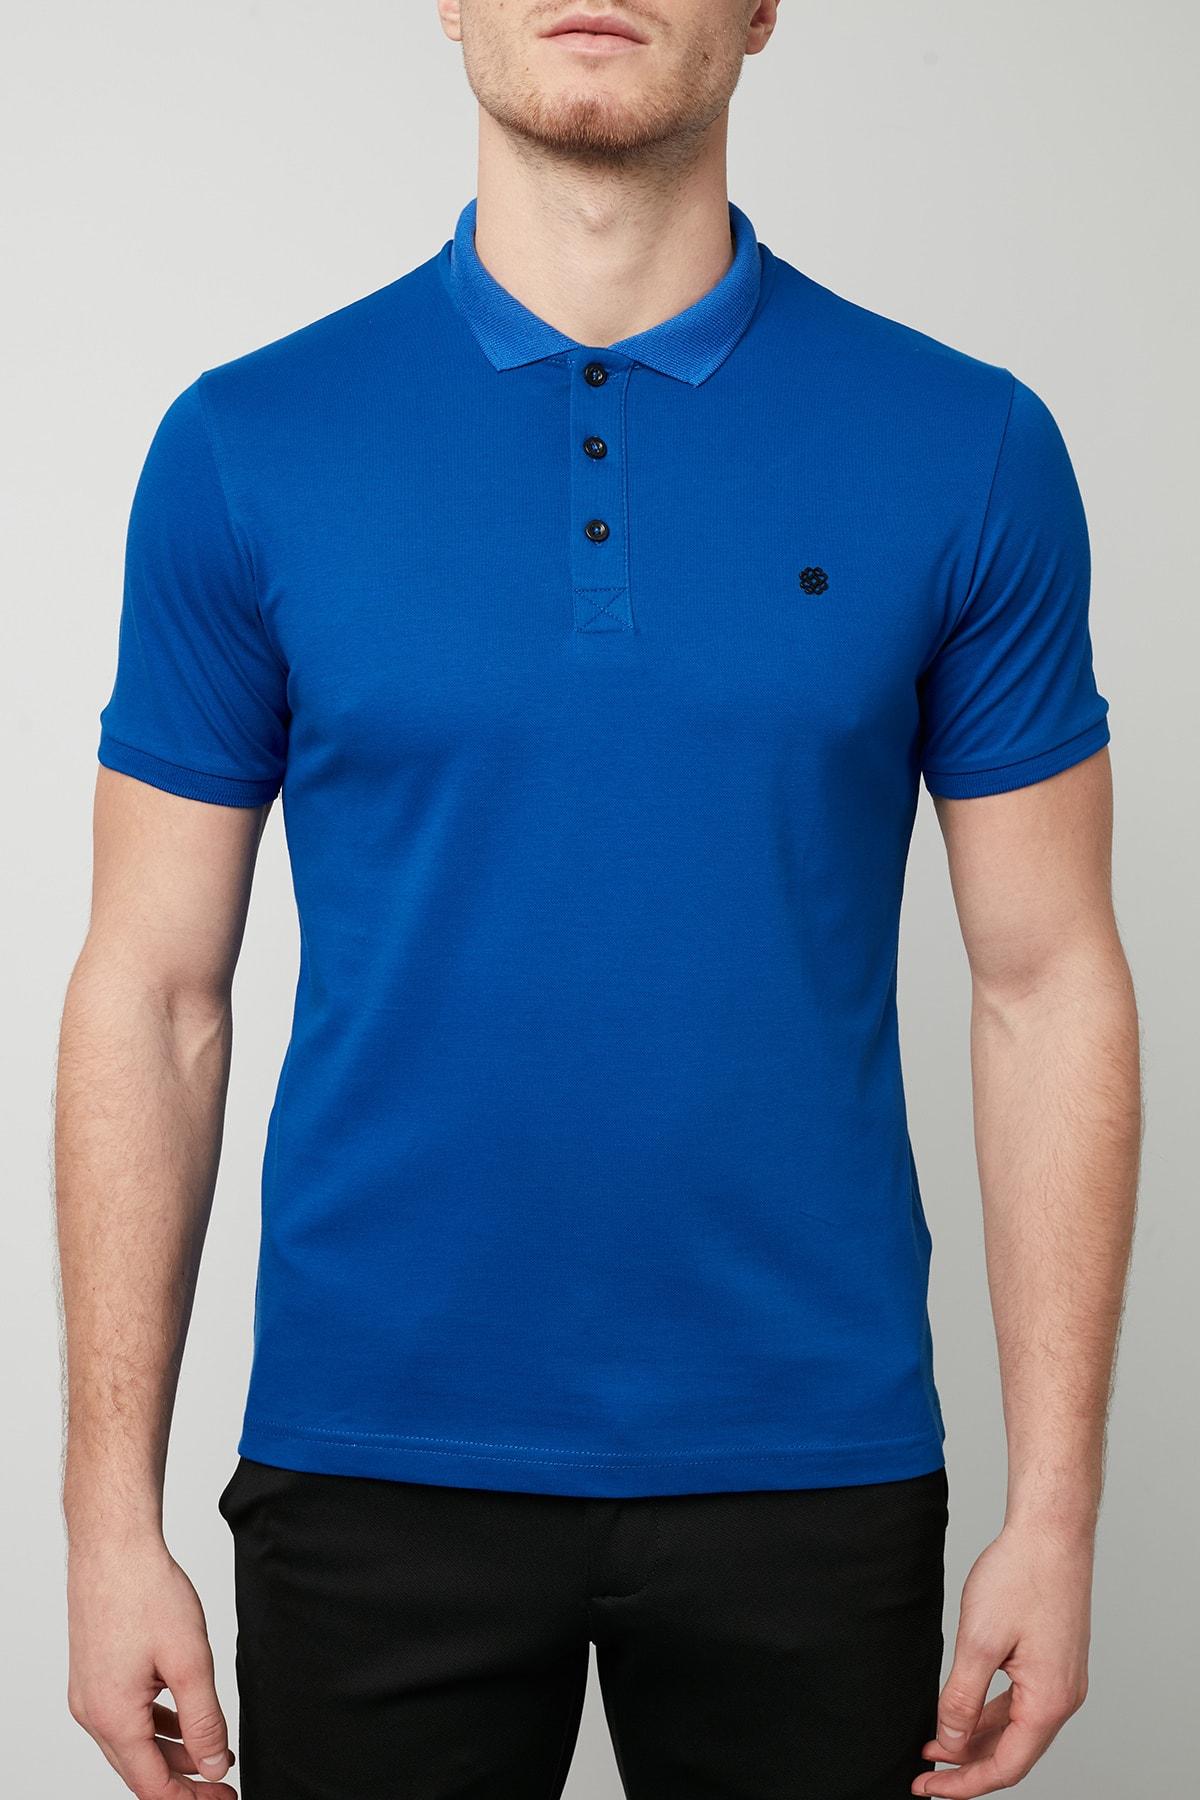 Buratti Erkek Parlıament Mavisi Düğmeli Polo Yaka Standart Fit Pamuklu T Shirt 0438101 4